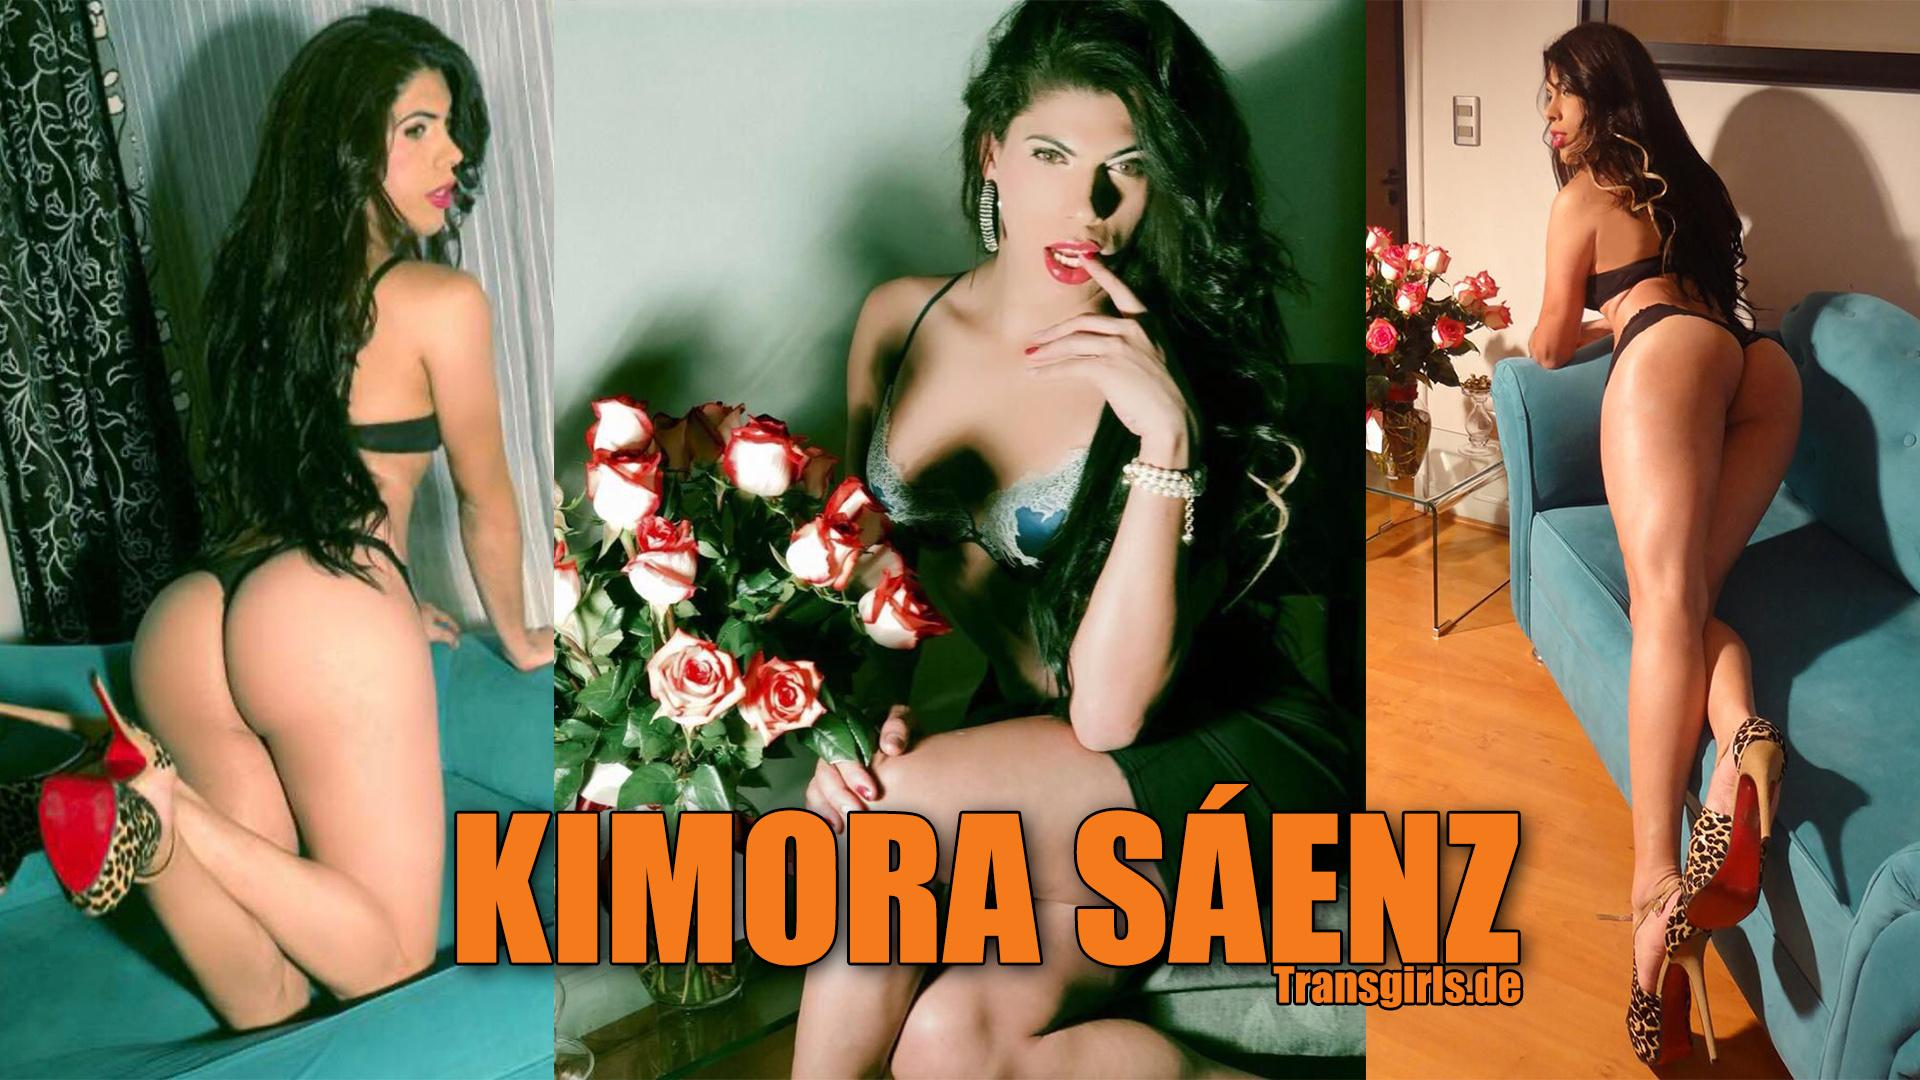 Kimora Saenz Shemale in Berlin